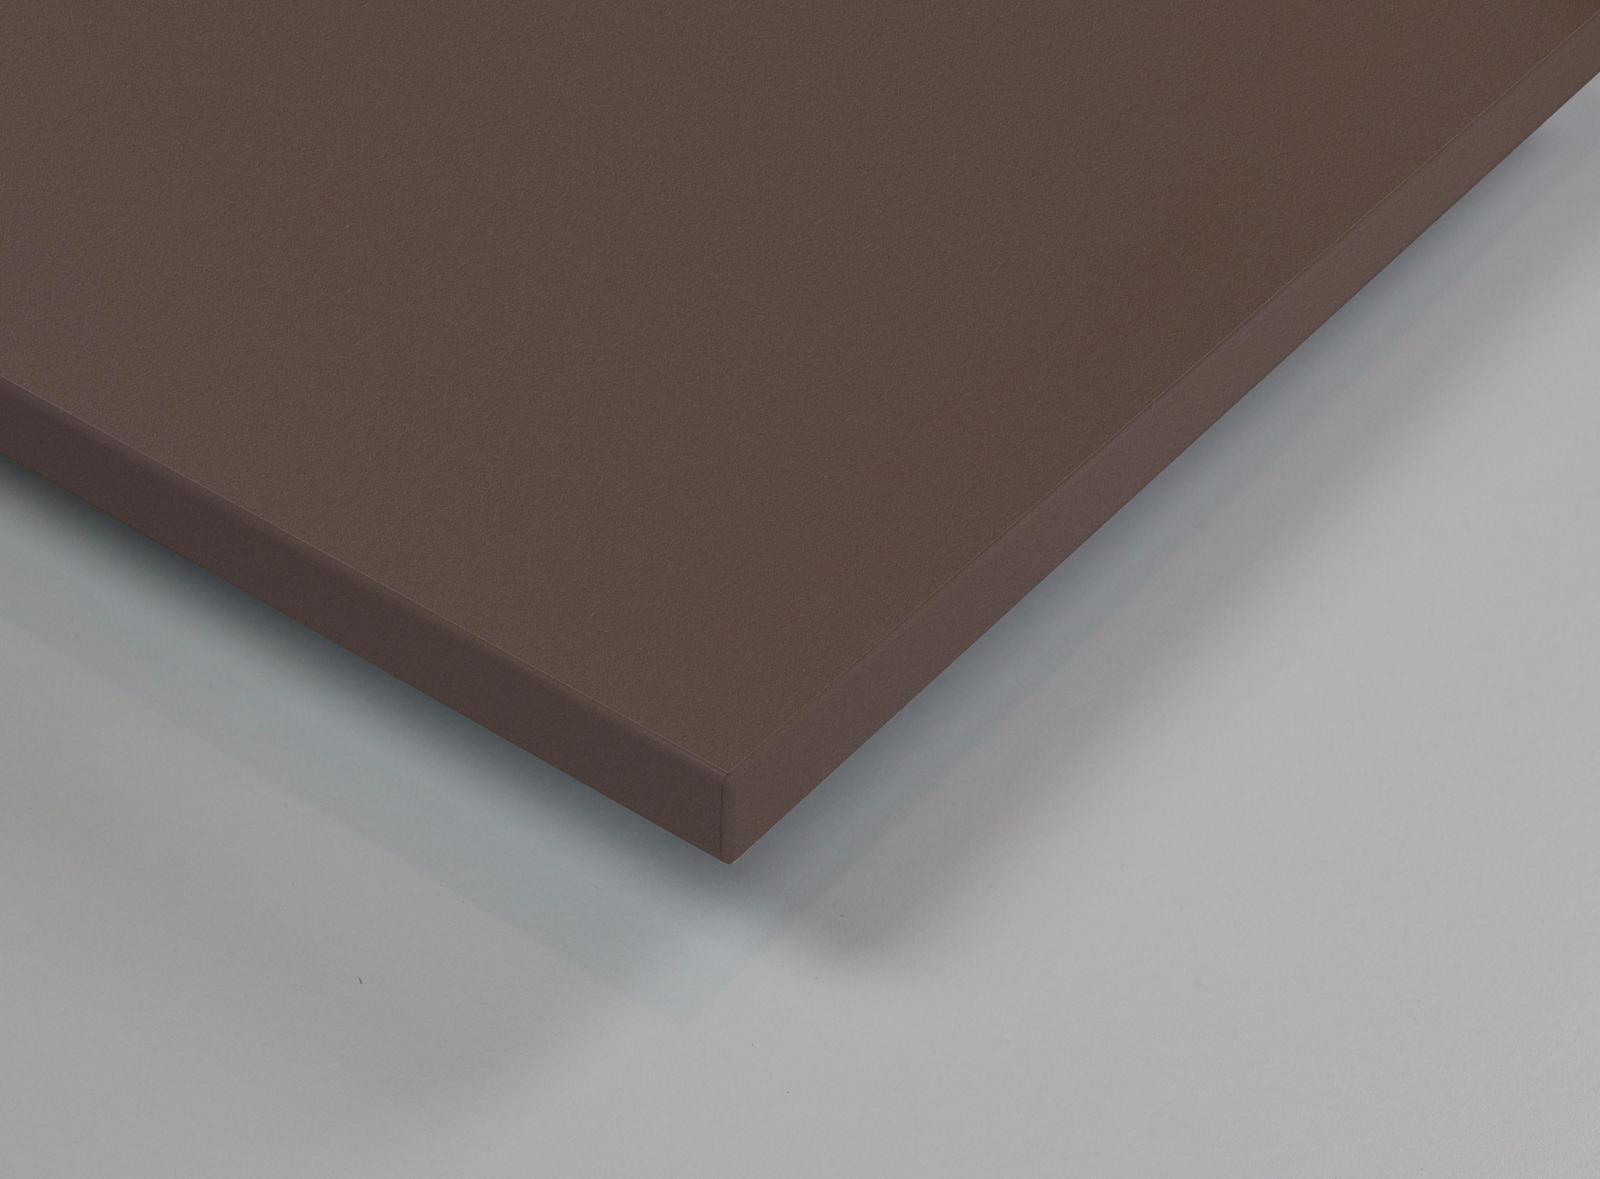 dekorholz braun holzzuschnitt. Black Bedroom Furniture Sets. Home Design Ideas